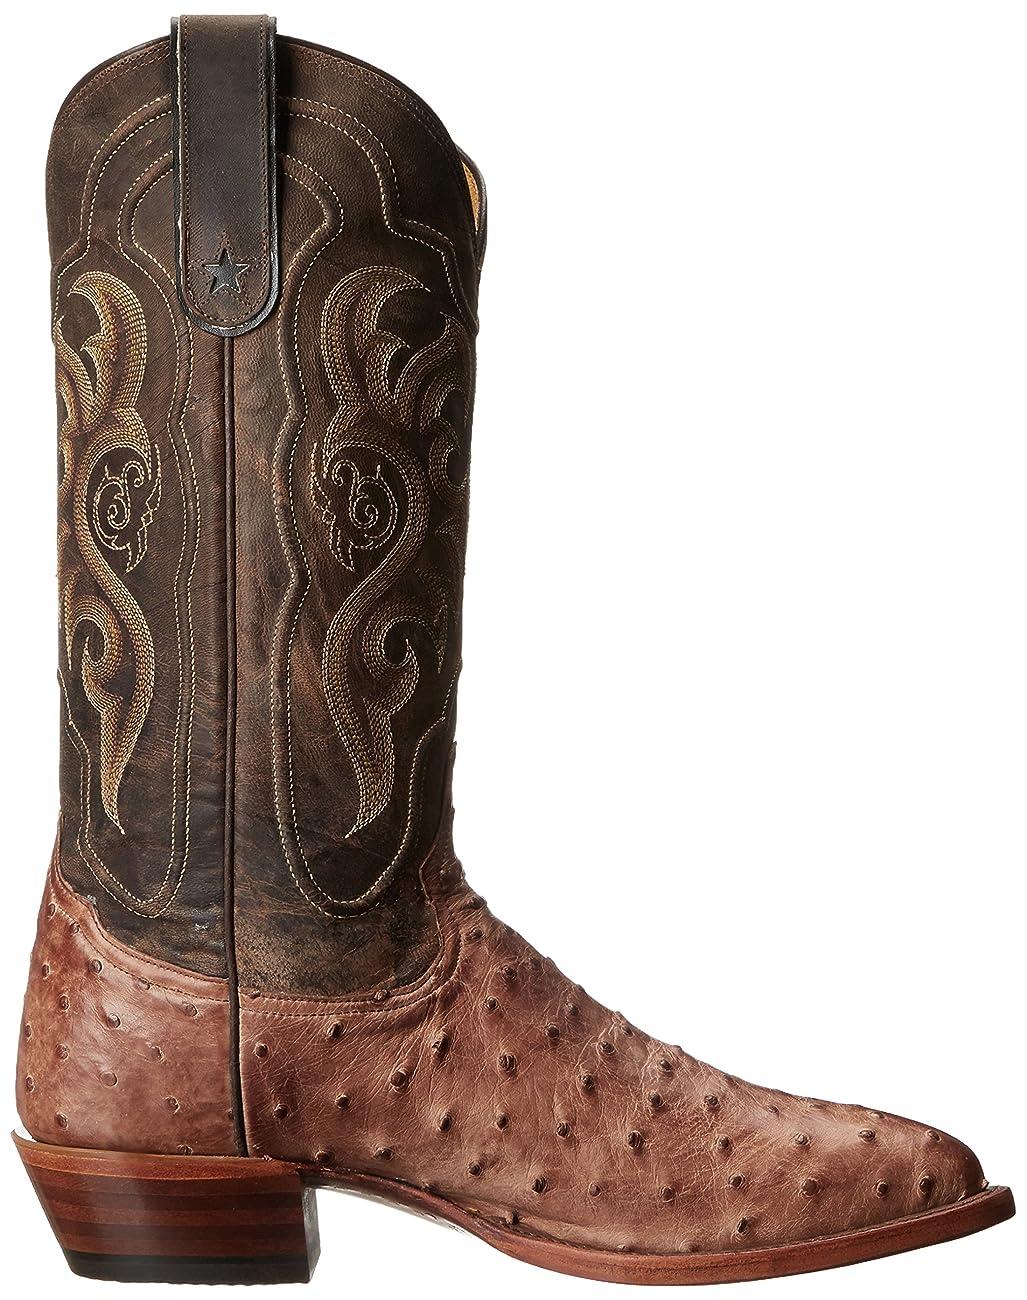 Tony Lama Boots Men's Vintage Ostrich 8965 Western Boot 5